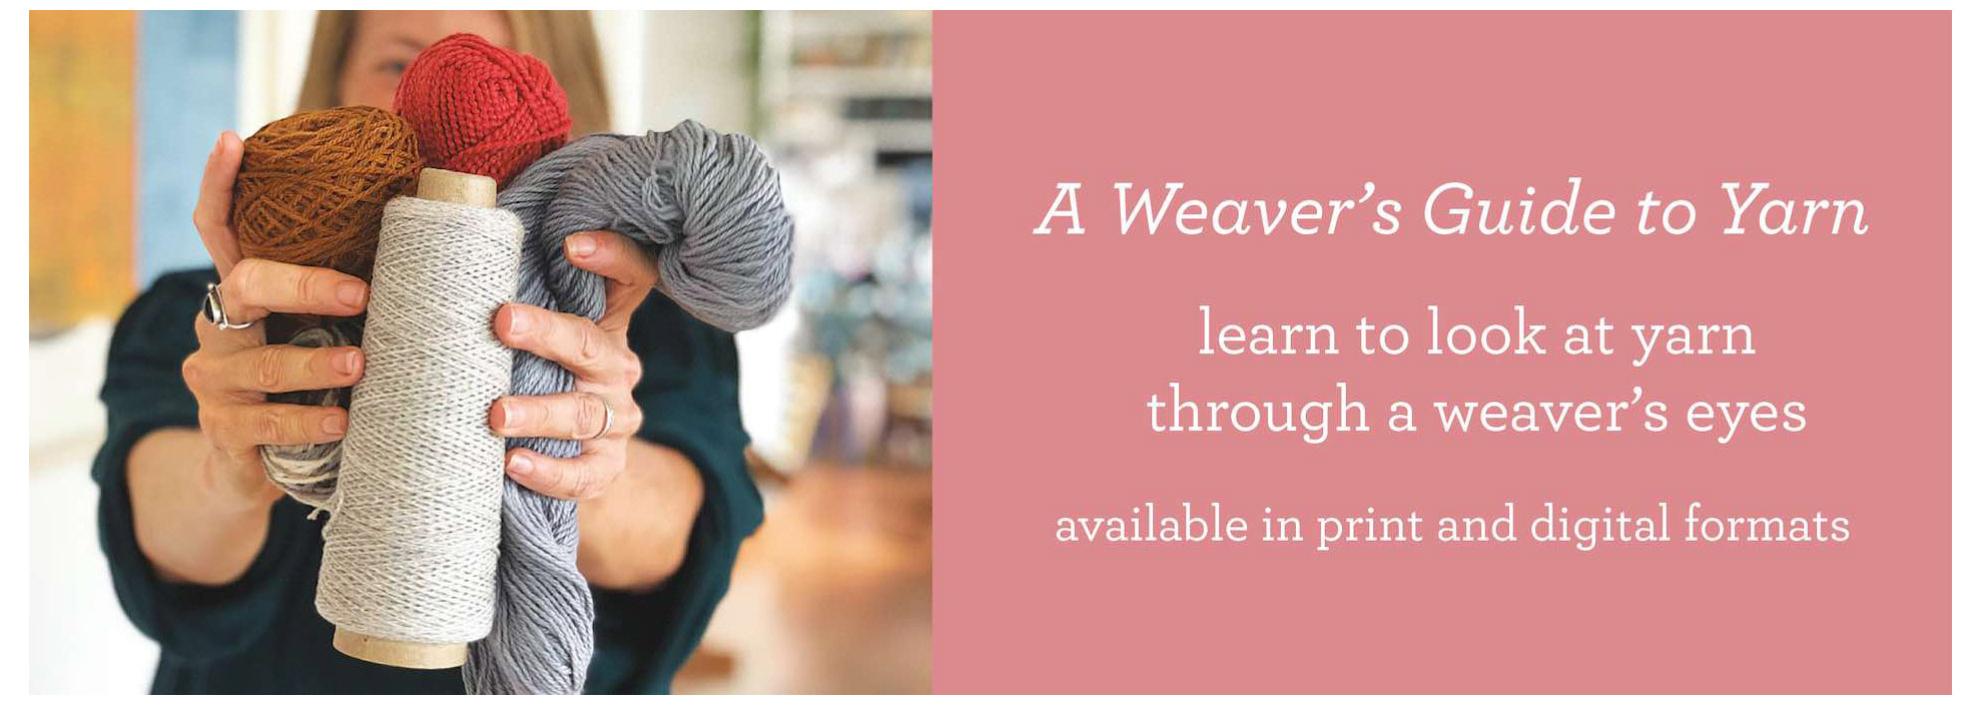 Weavers-Guide-to-Yarn-3-1980x706_c